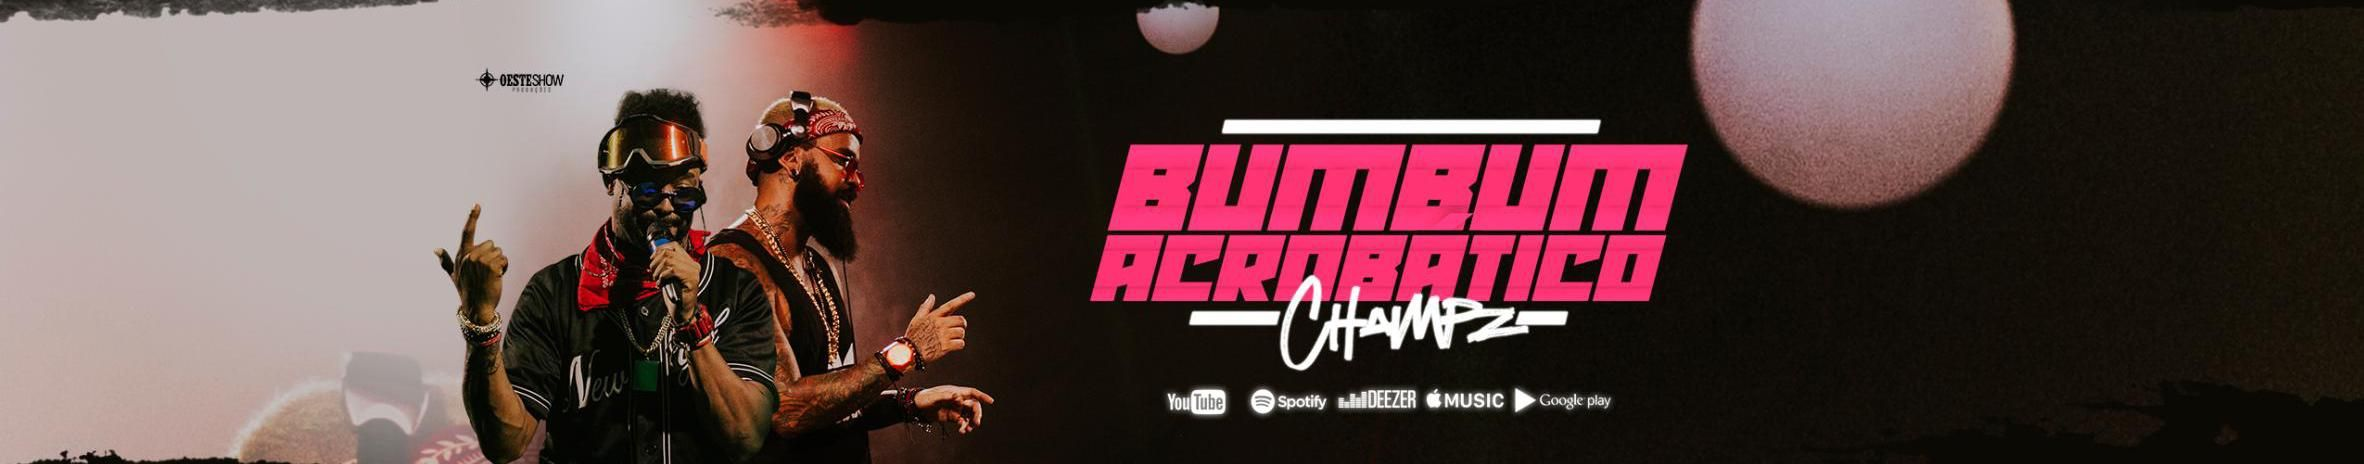 Imagem de capa de Champz